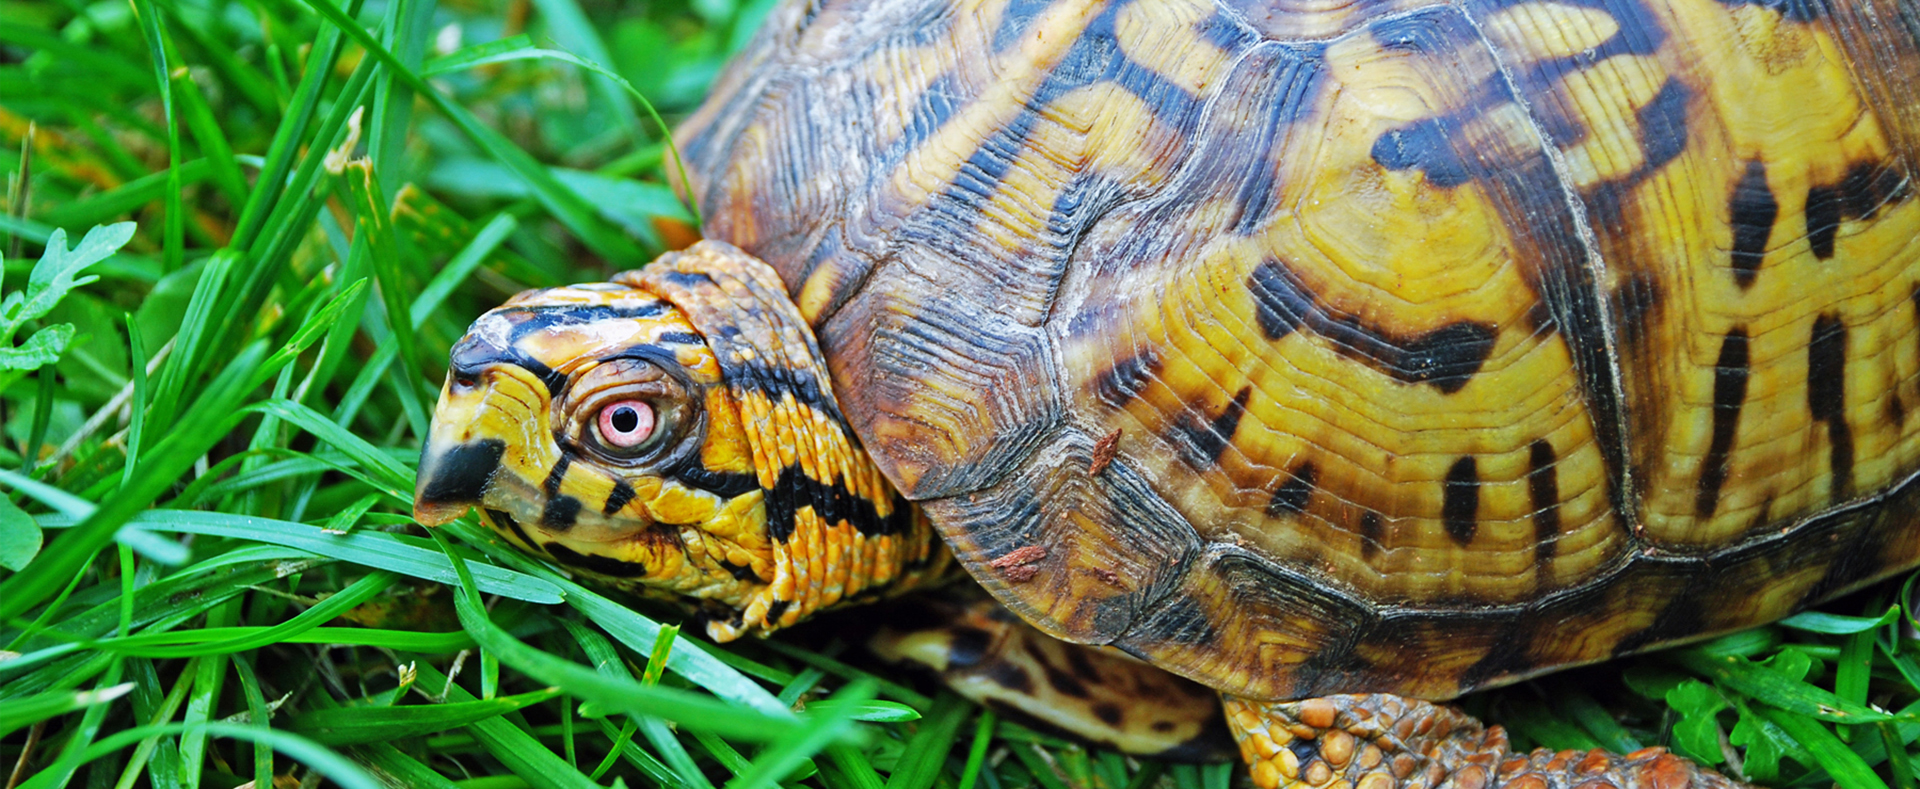 Eastern Box Turtle - Lehigh Valley Zoo